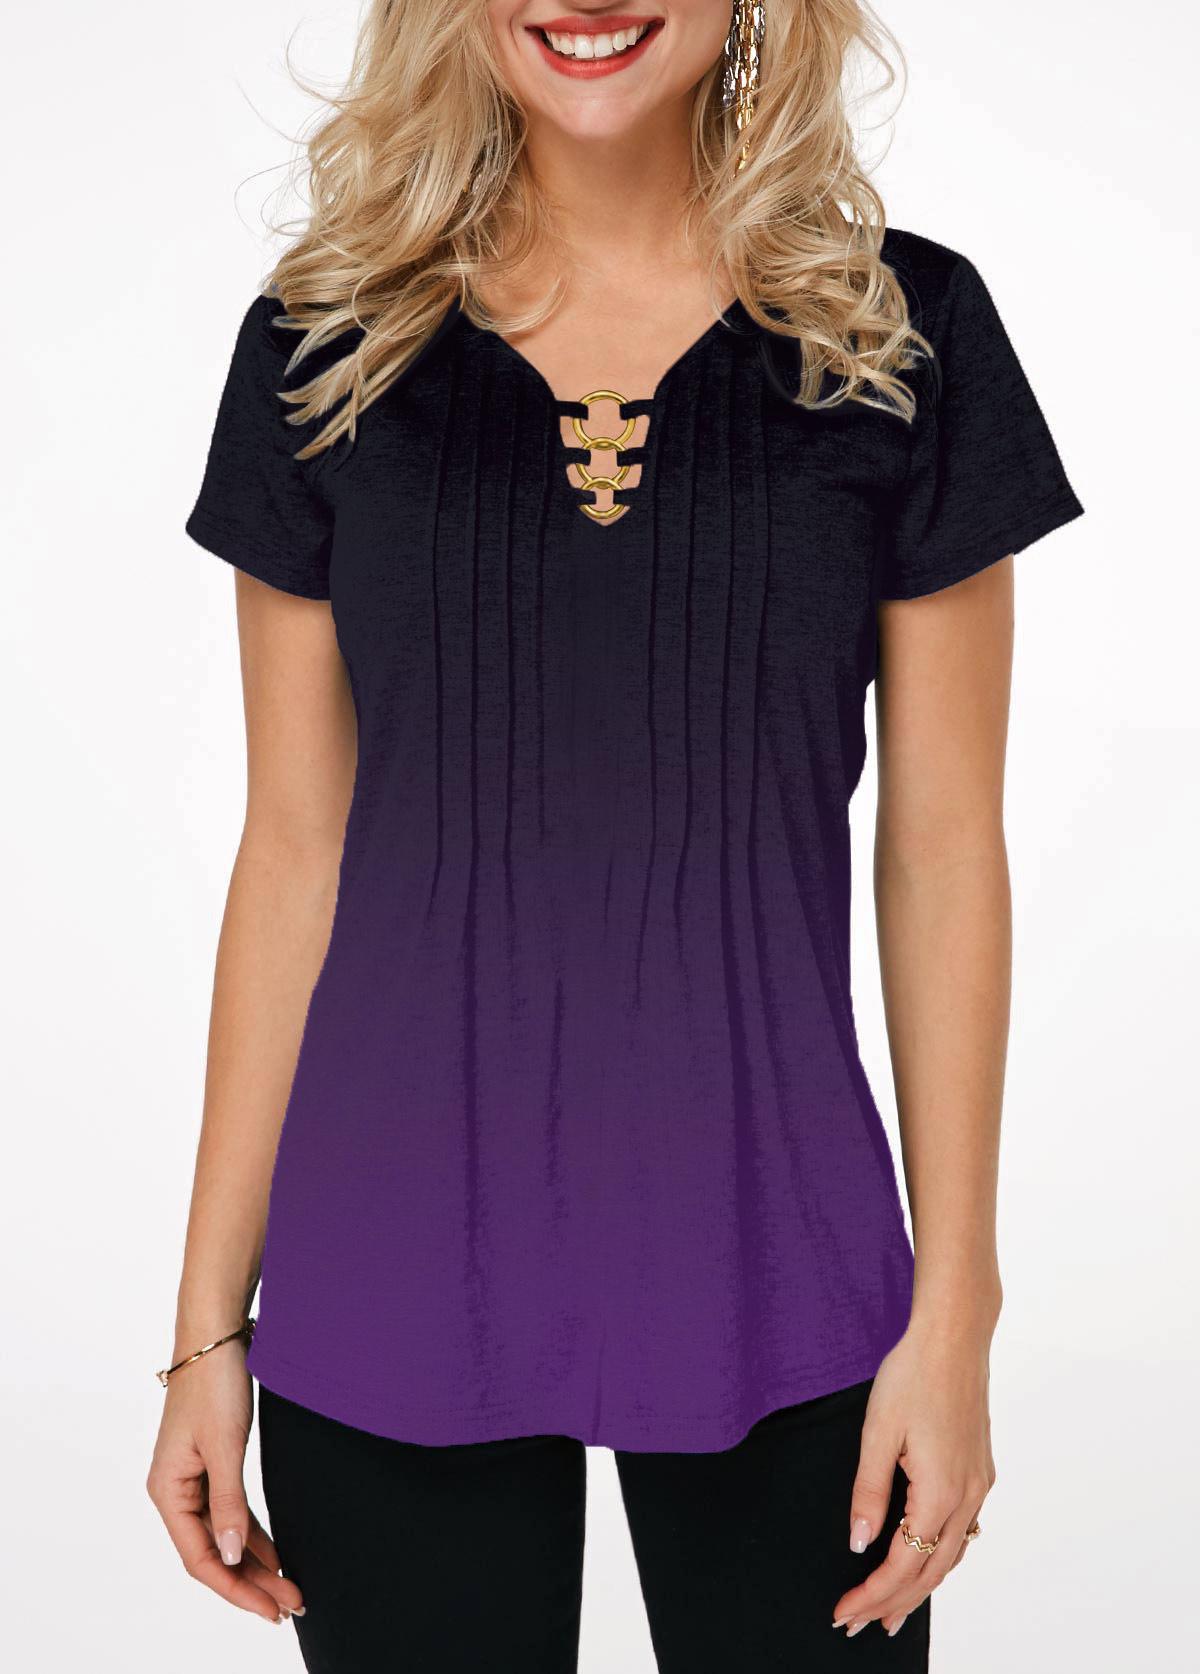 Short Sleeve Metal Ring Embellished Gradient T Shirt